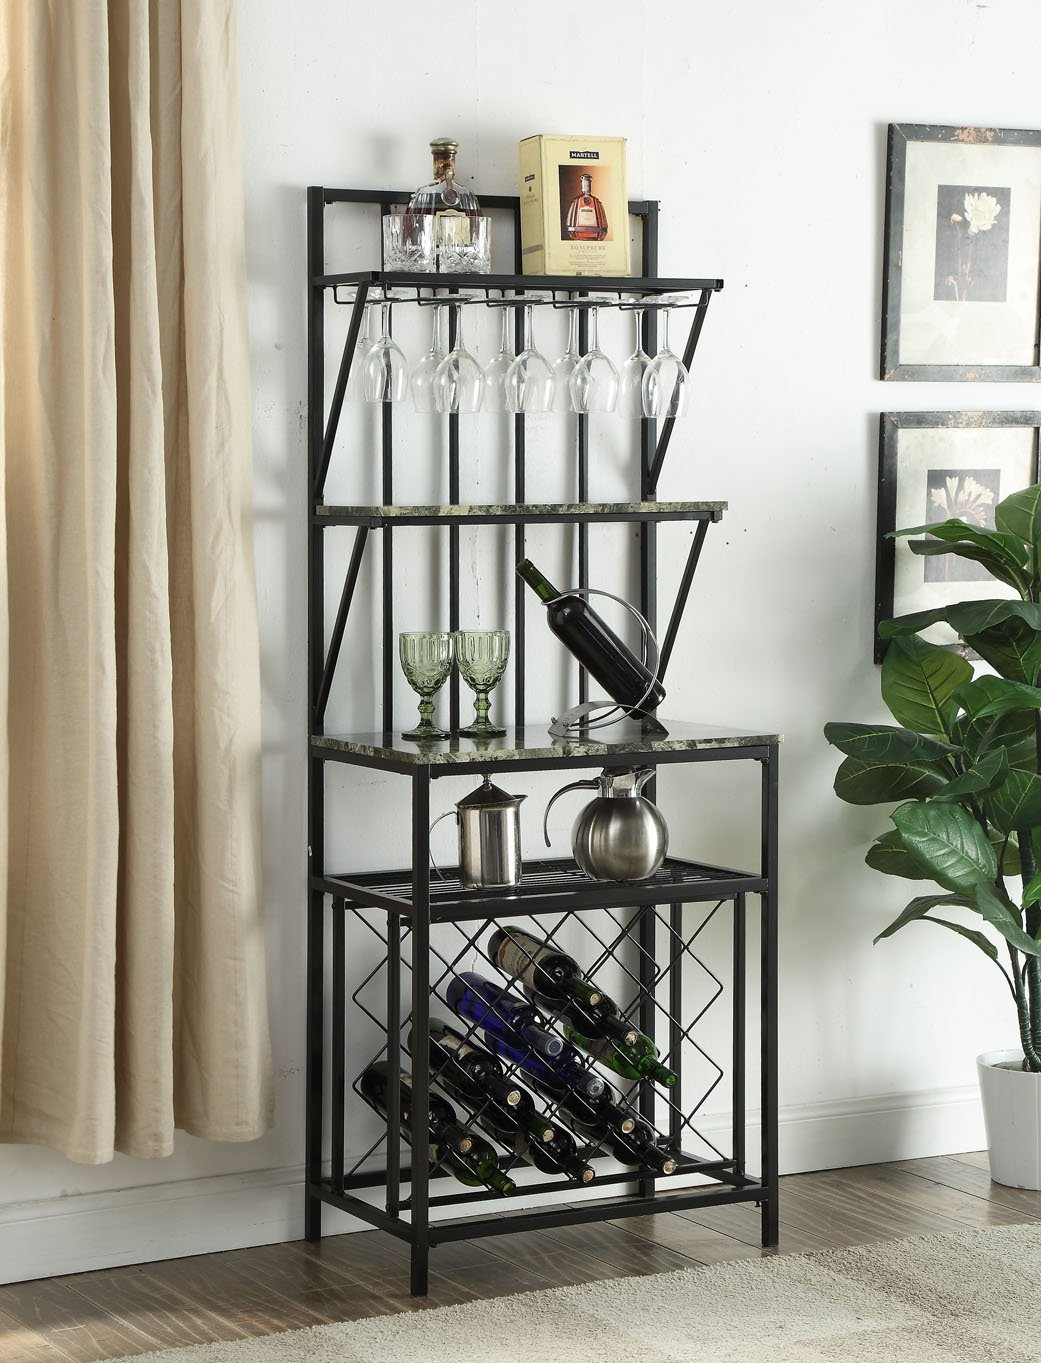 4-tier Black Metal Marble Look Finish Shelf Kitchen Bakers Rack Scroll Design with 20 Bottles Wine Storage